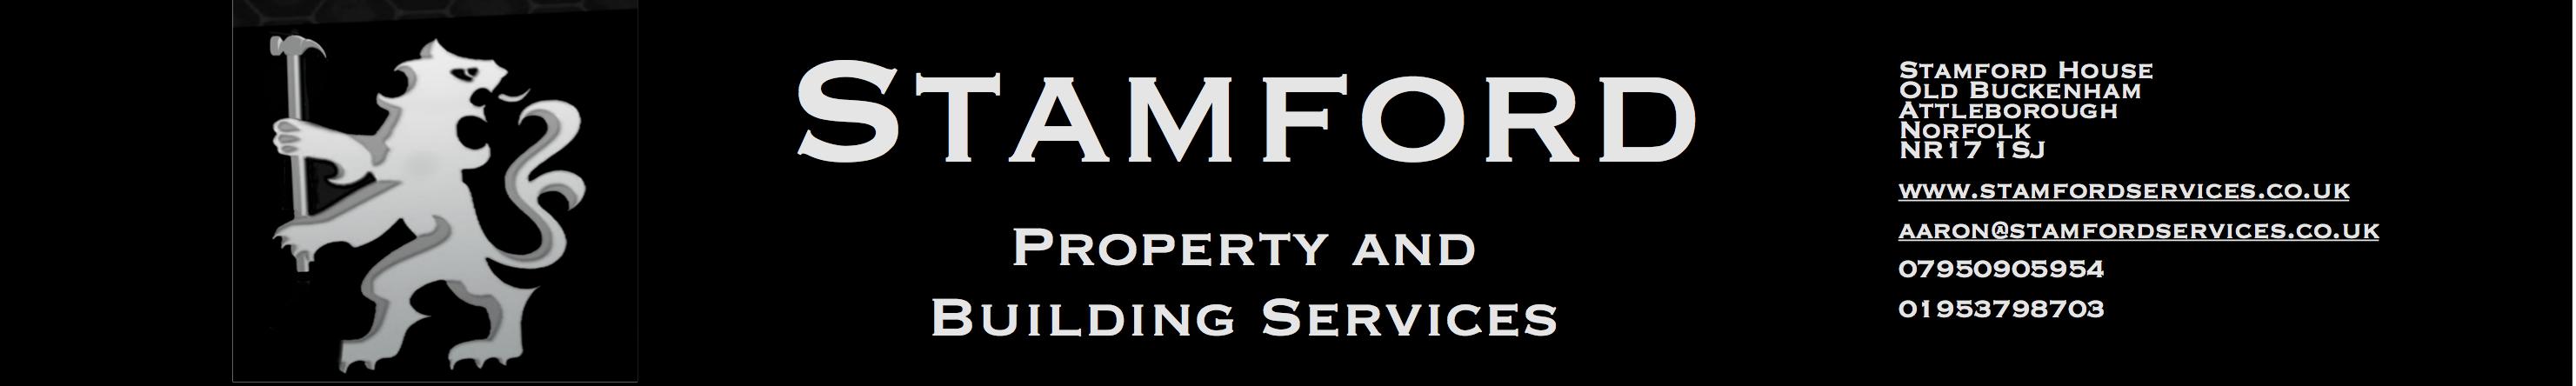 Stamford Property and Building Services LTD - Attleborough, Norfolk NR17 1SJ - 01953 798703 | ShowMeLocal.com